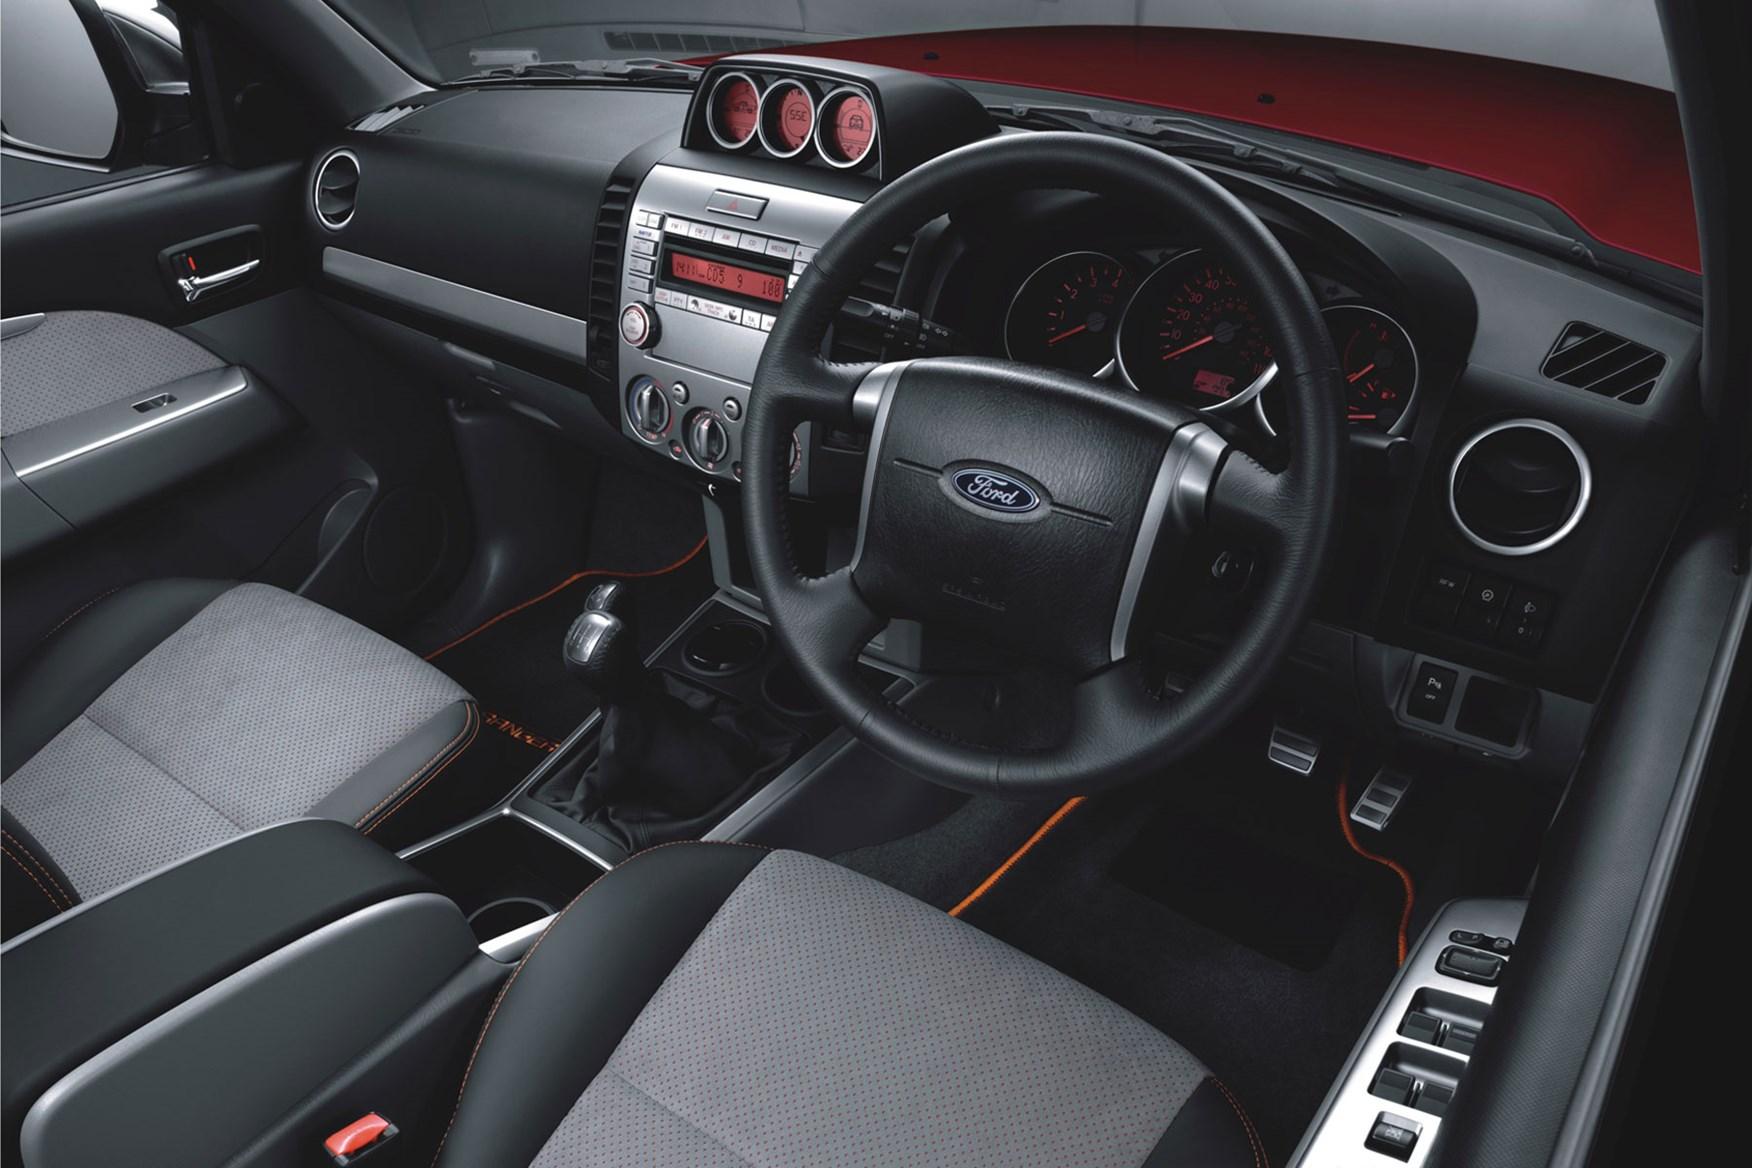 Ford Ranger (2006-2011) cab interior